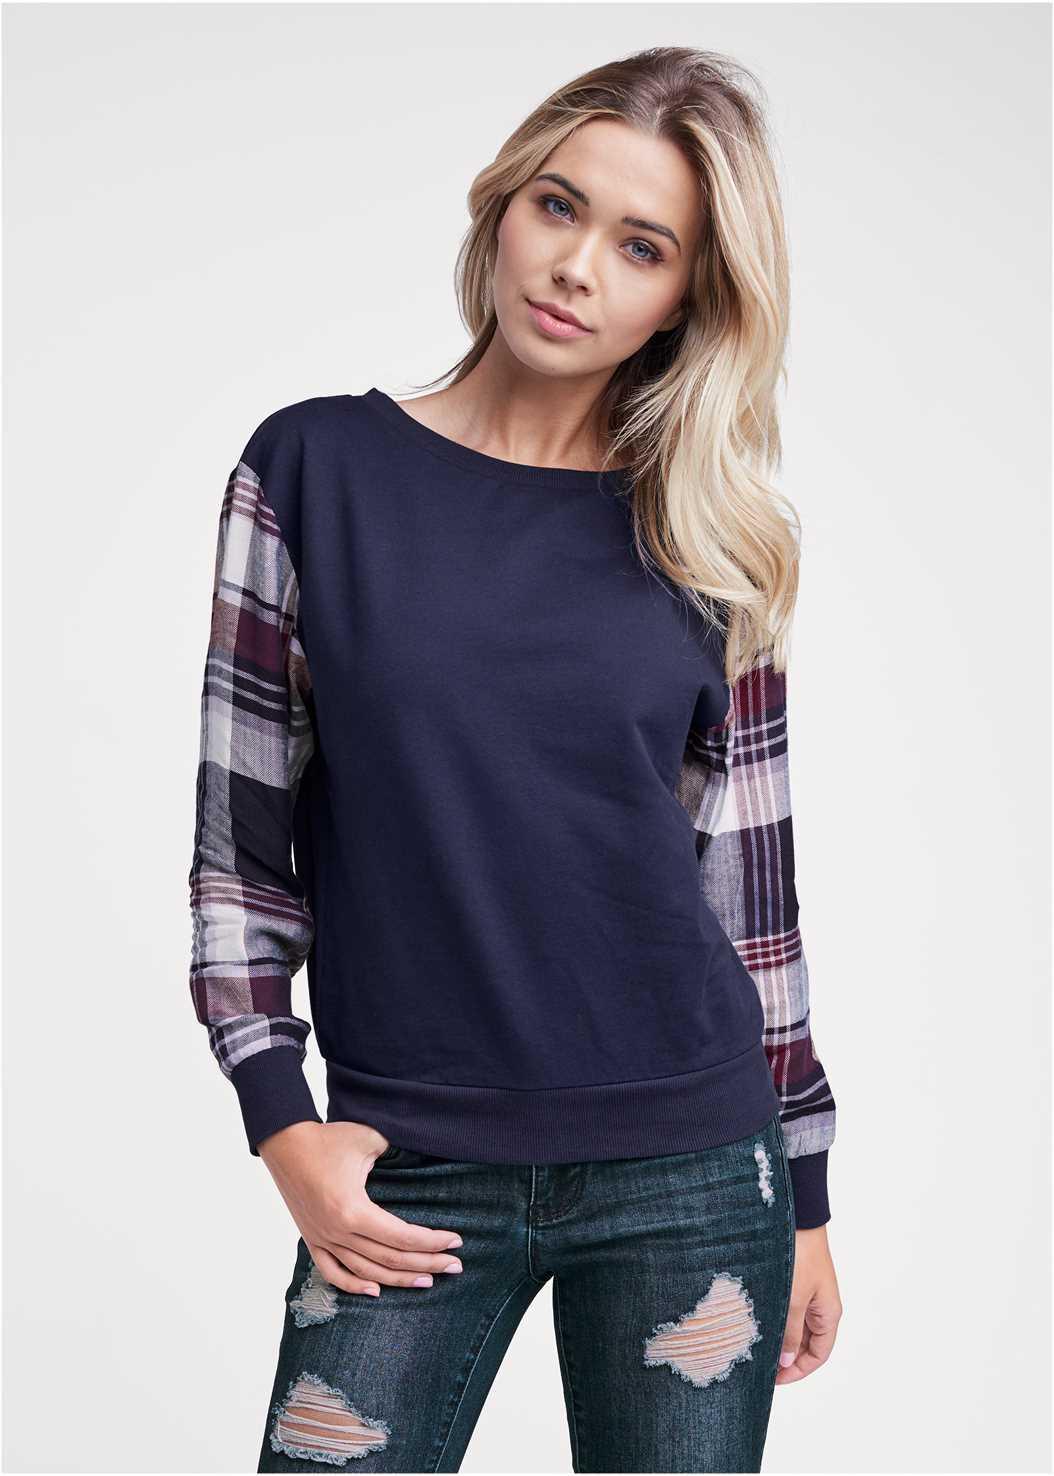 Plaid Sleeve Sweatshirt,Ripped Skinny Jeans